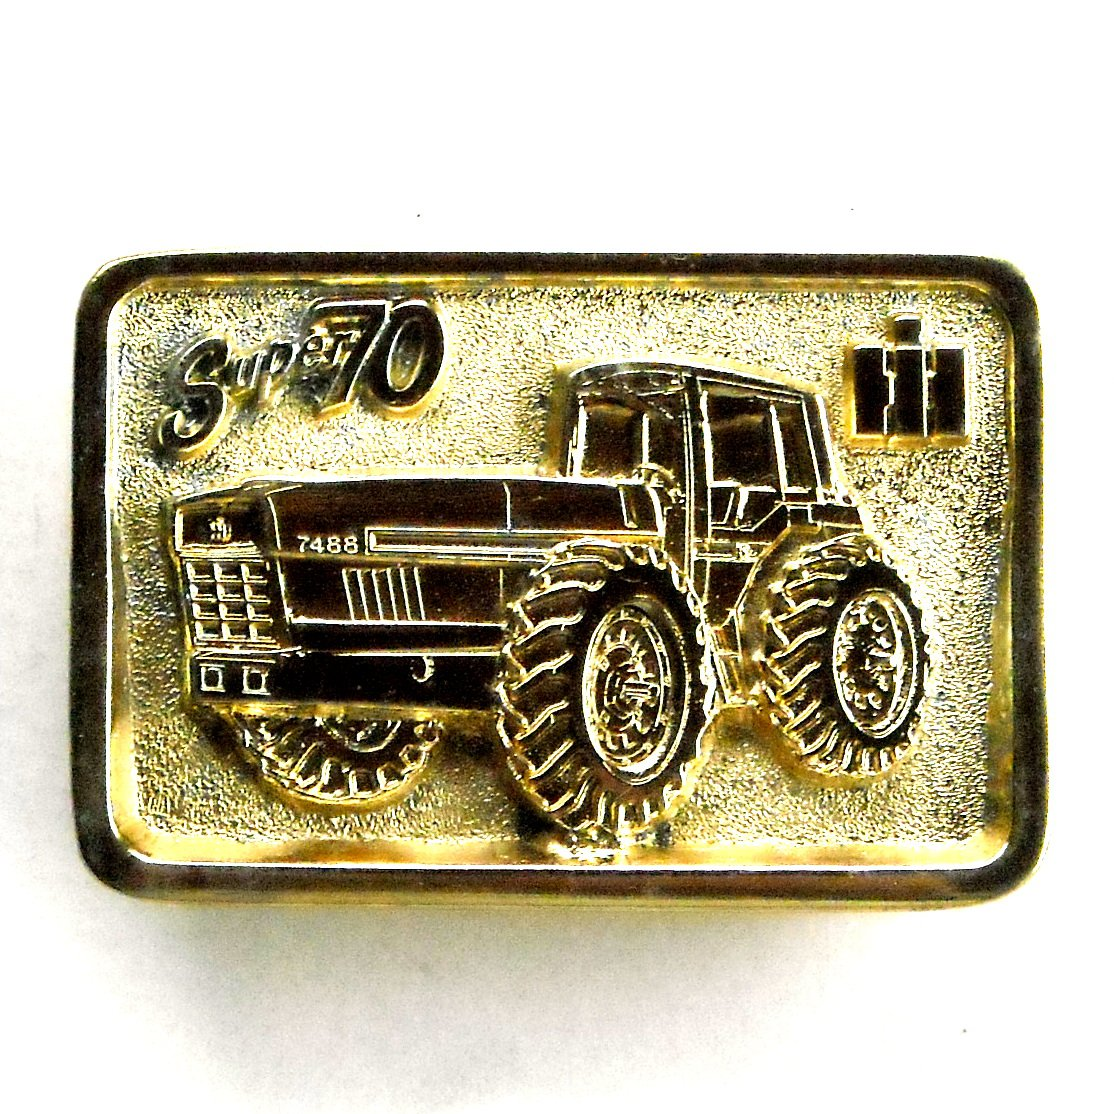 IH Super 70 Dallas Edition Gold Color Belt Buckle